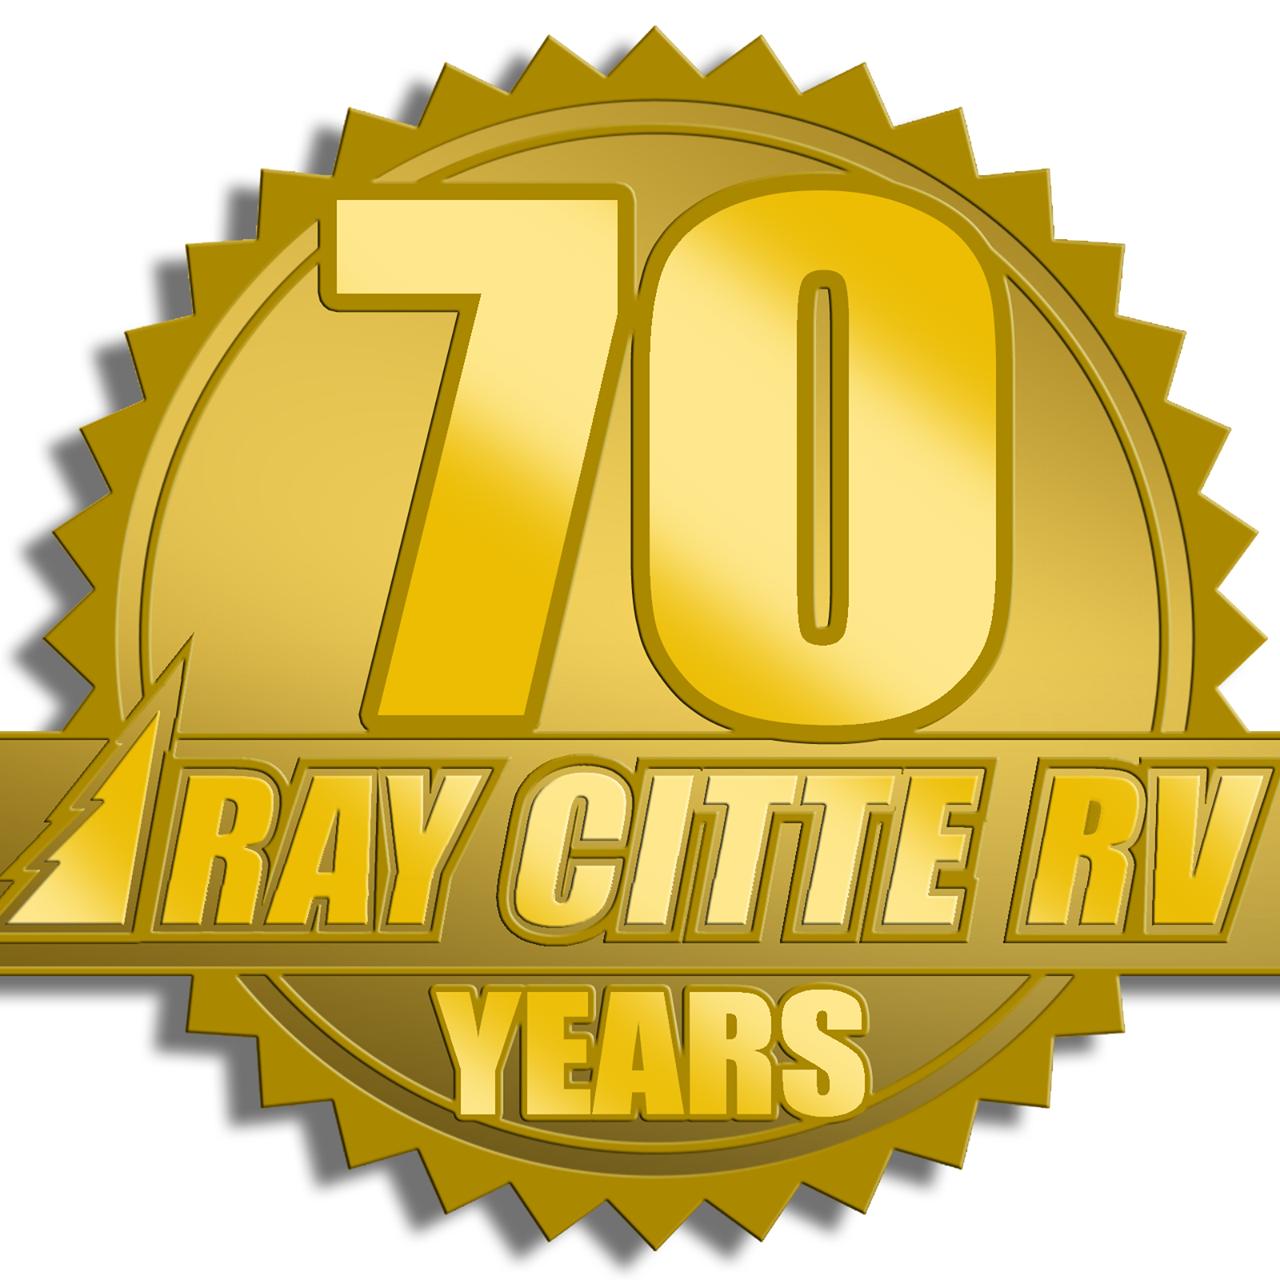 Ray Citte RV